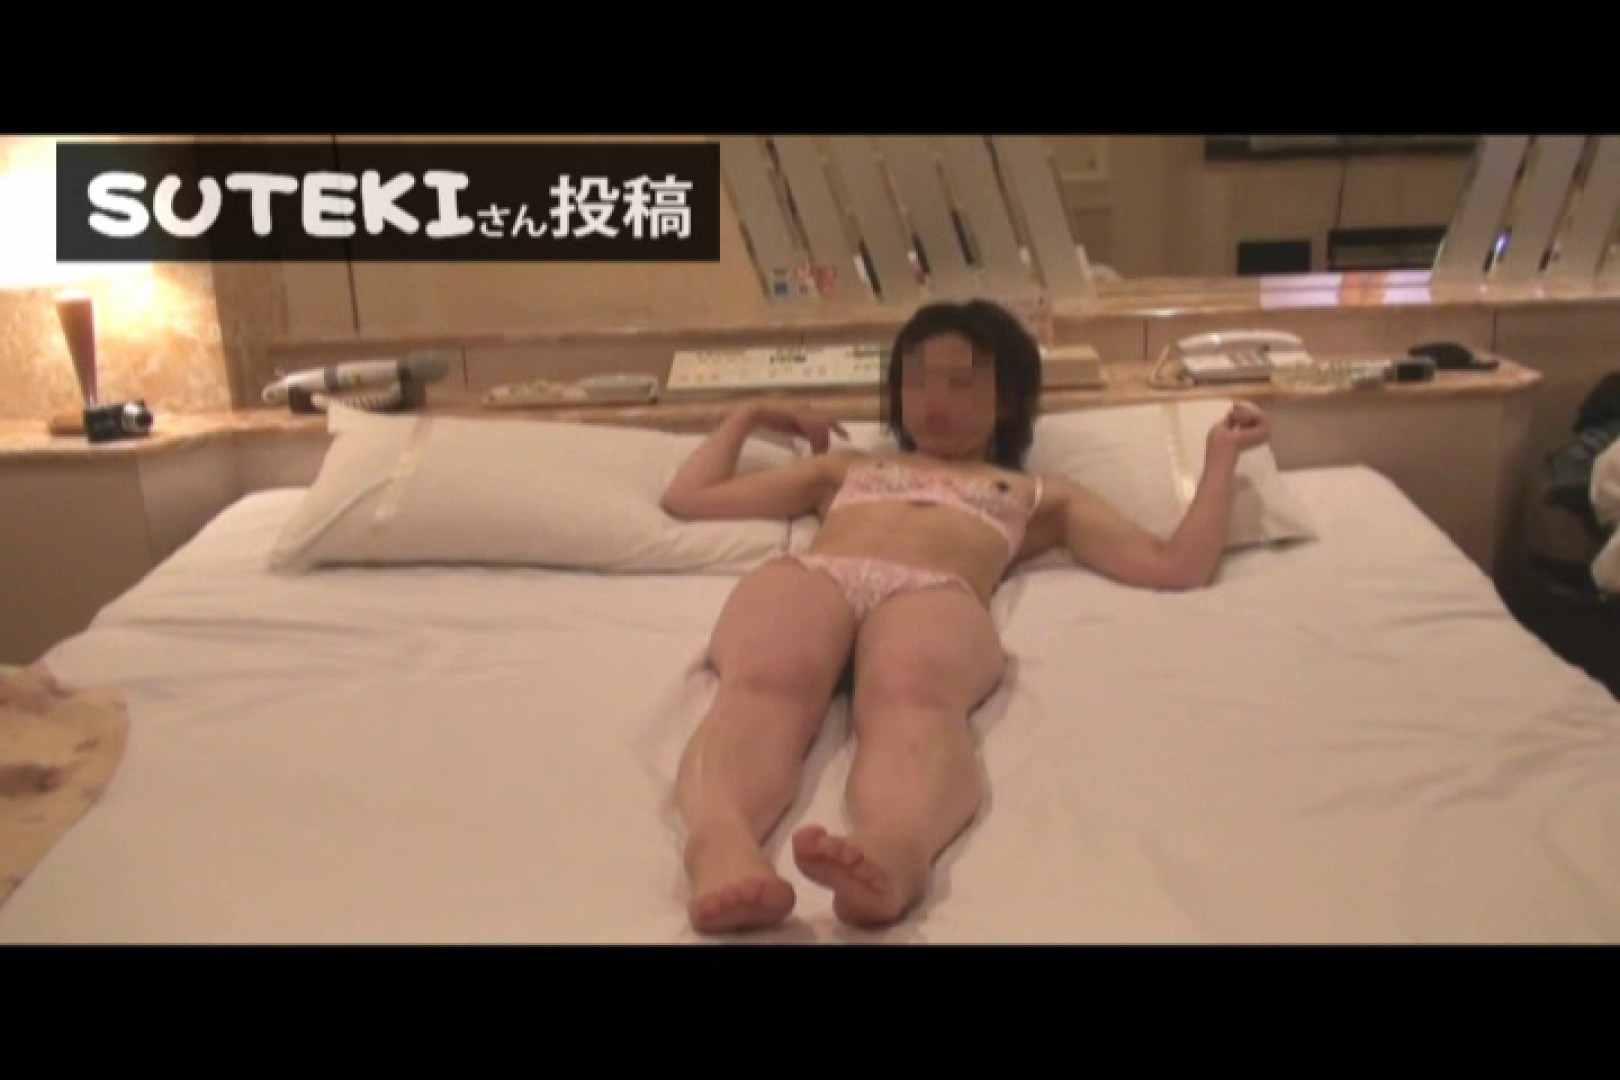 SUTEKIさん投稿 Hな記録、ピンクオープンブラ 素人 戯れ無修正画像 103pic 19